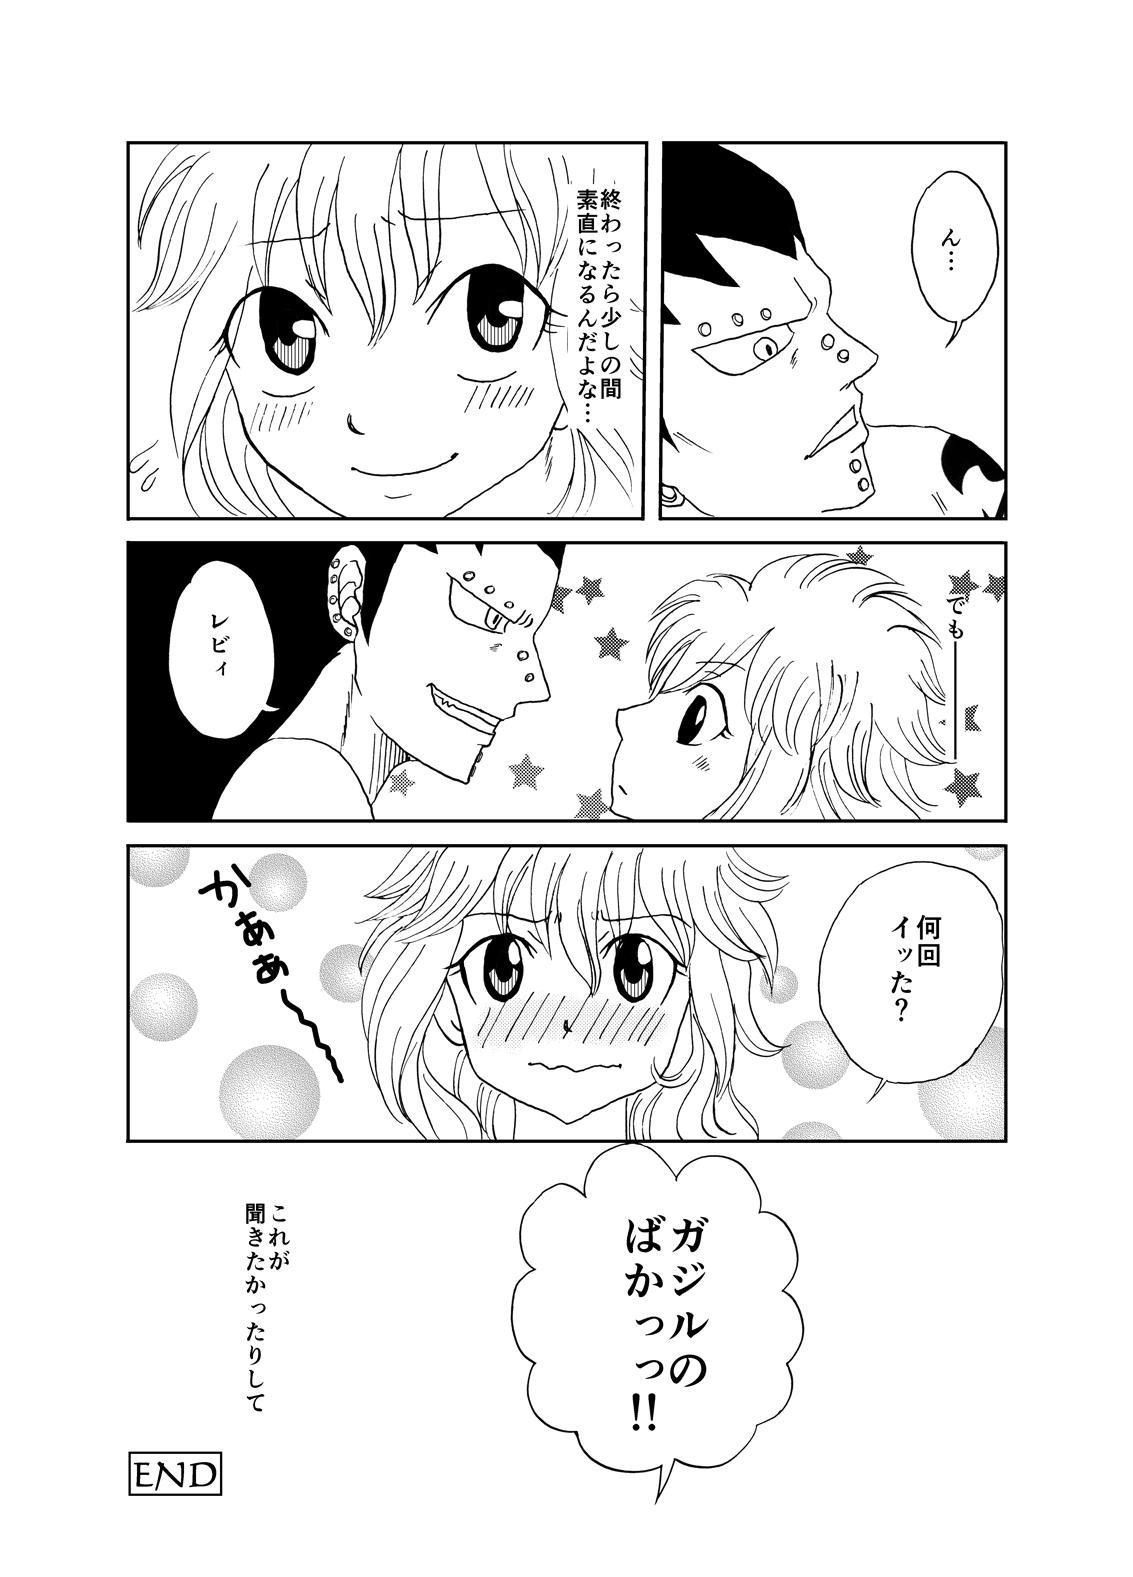 [Cashew] GajeeLevy Manga - Levy-chan ni Gohoushi (Fairy Tail) 19